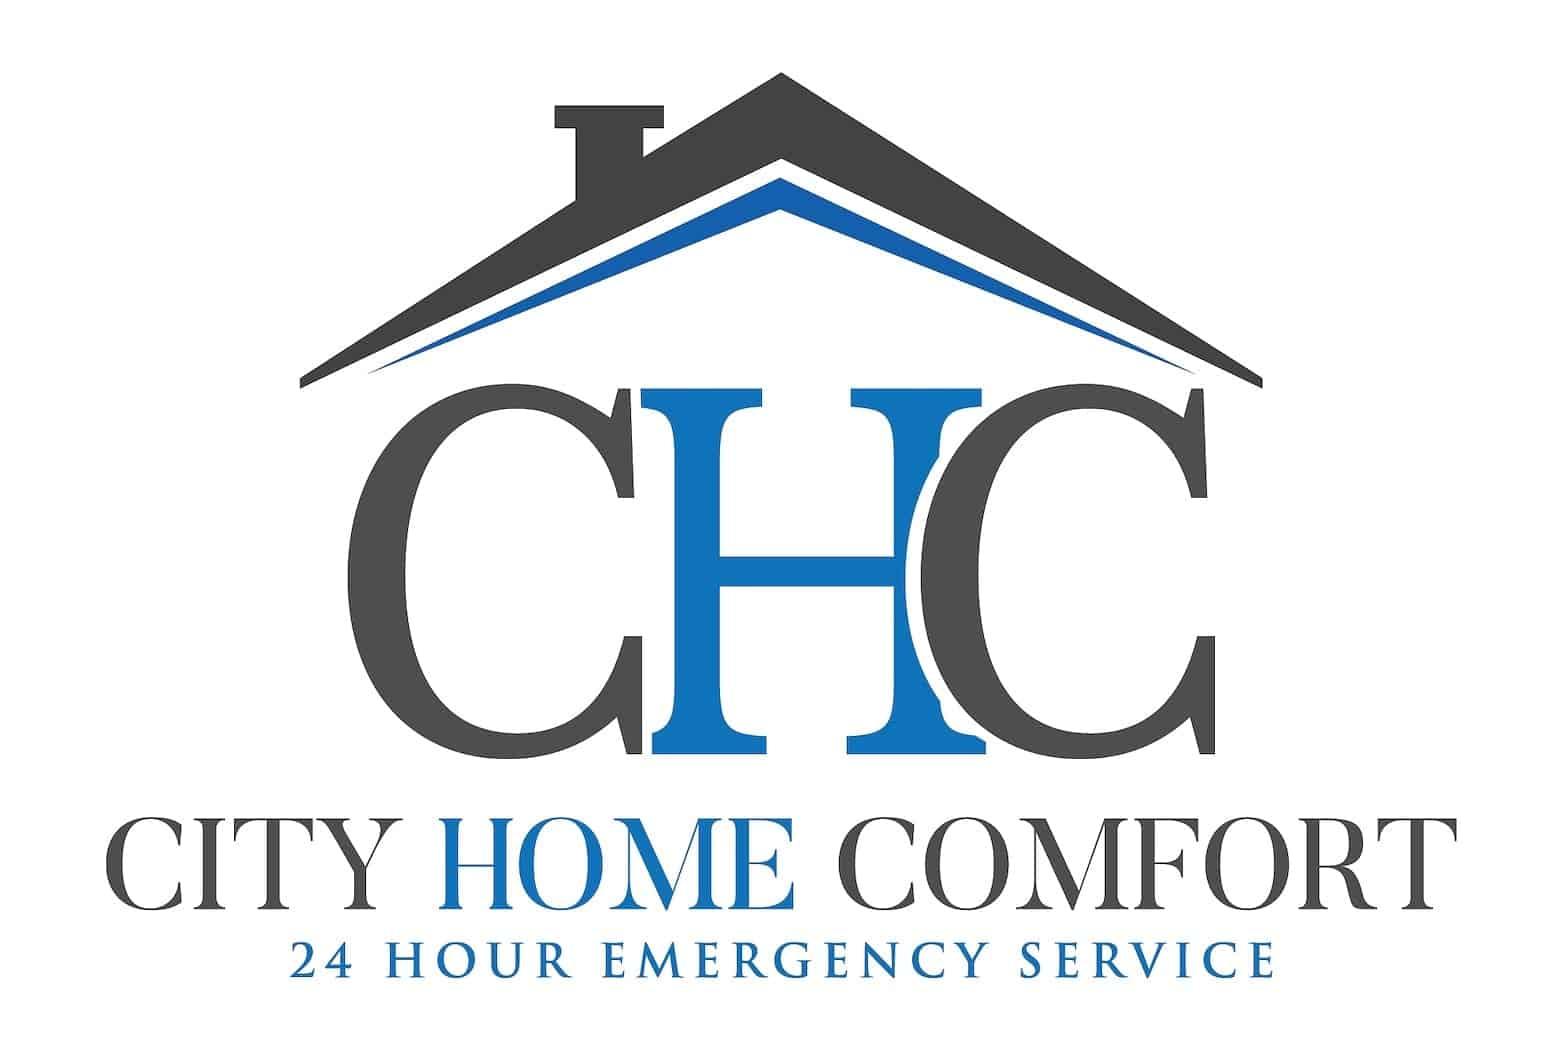 City Home Comfort